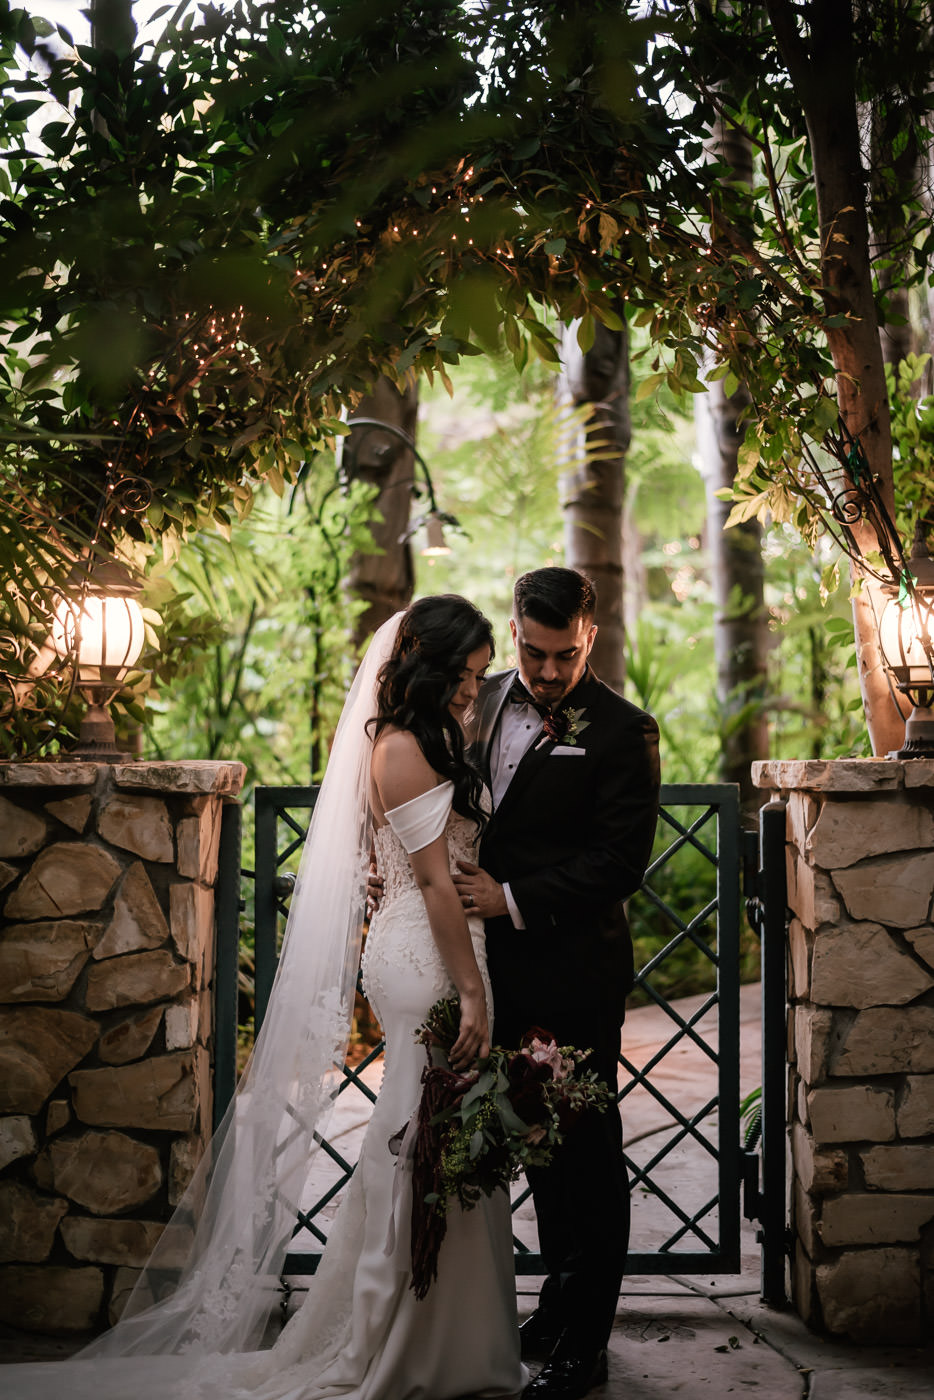 eden-gardens-wedding-photographer-romantic-82.jpg